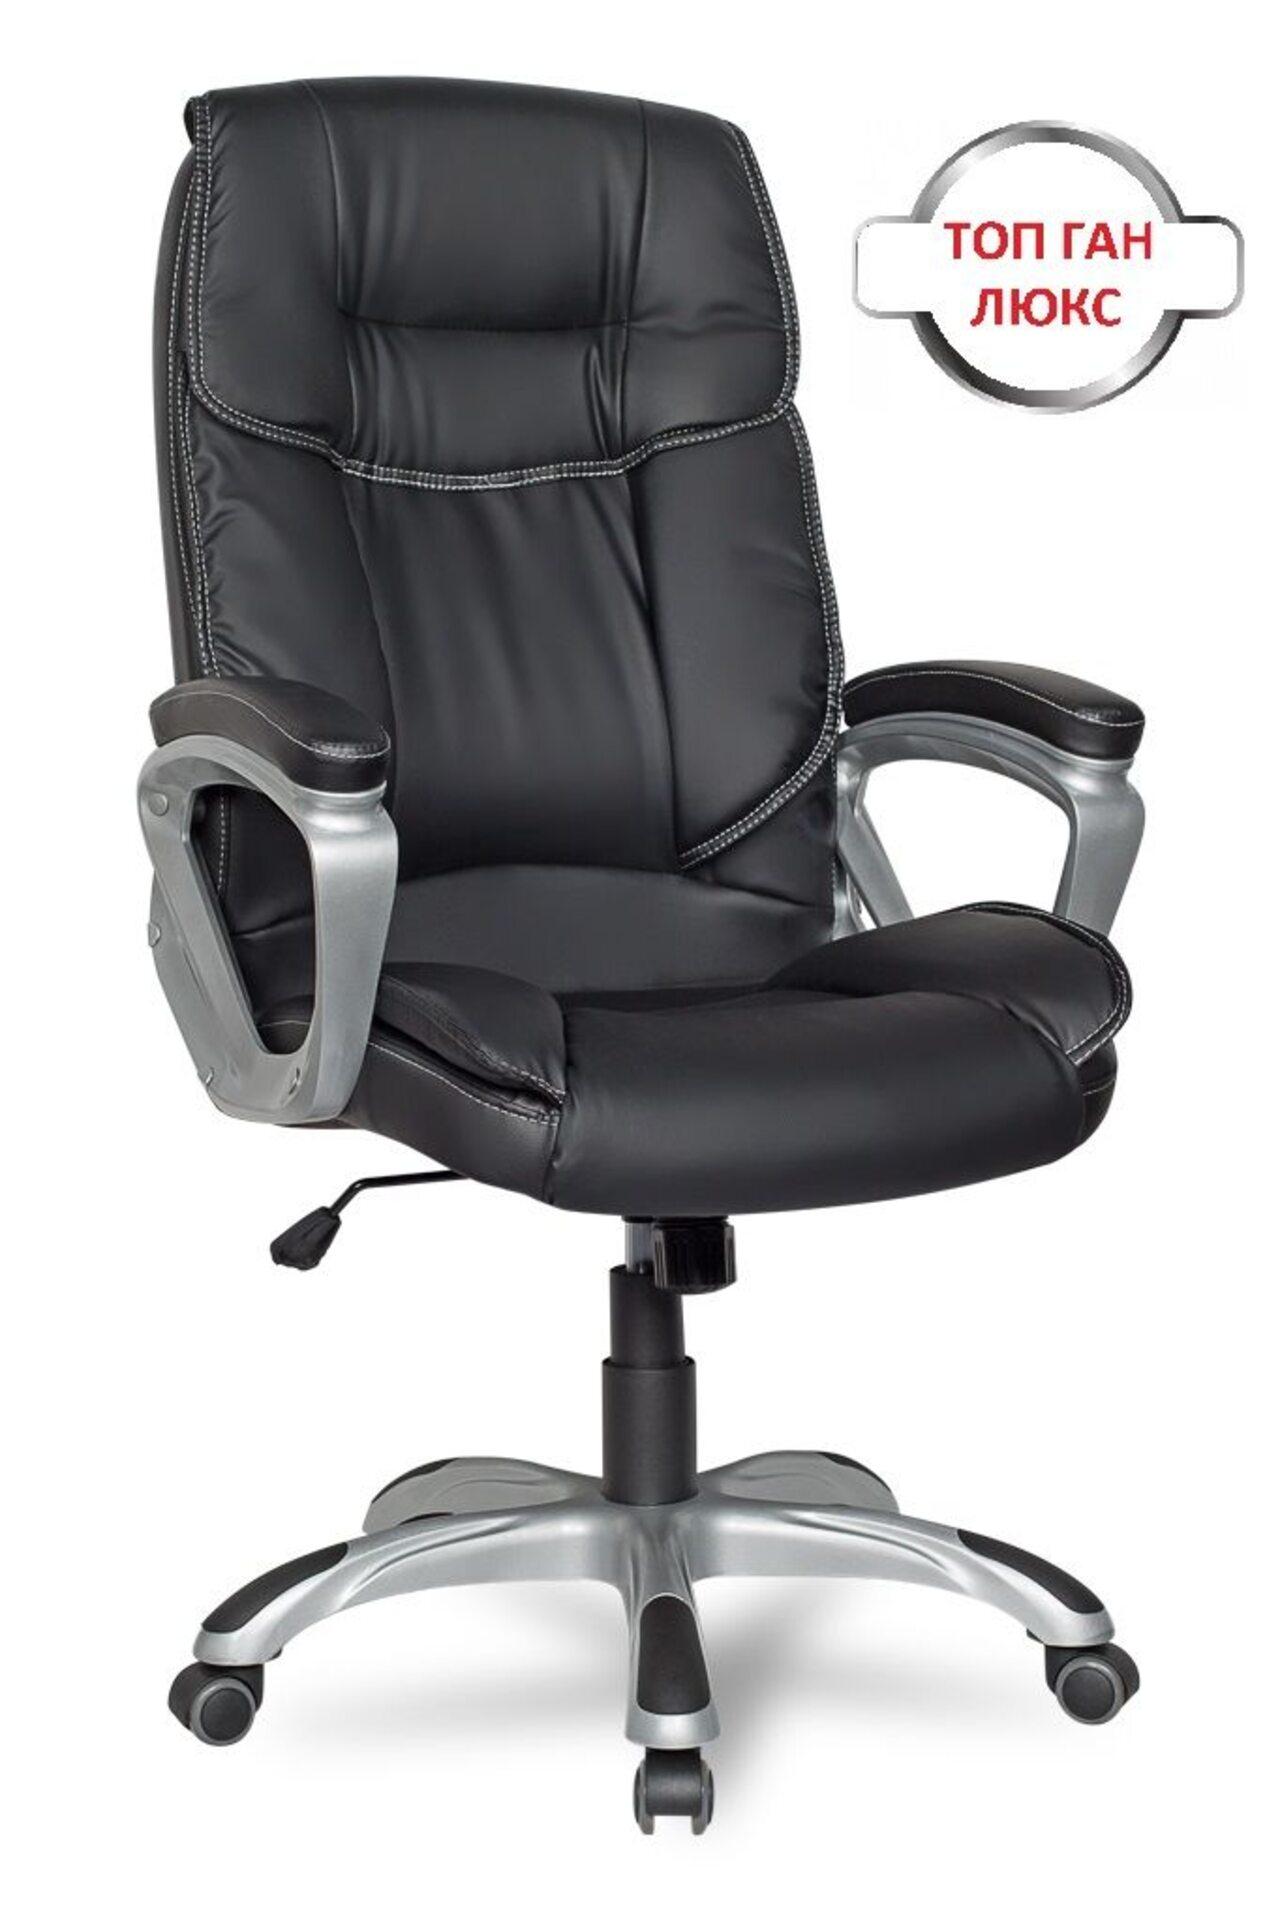 Кресло руководителя College CLG-615 LXH - фото 2